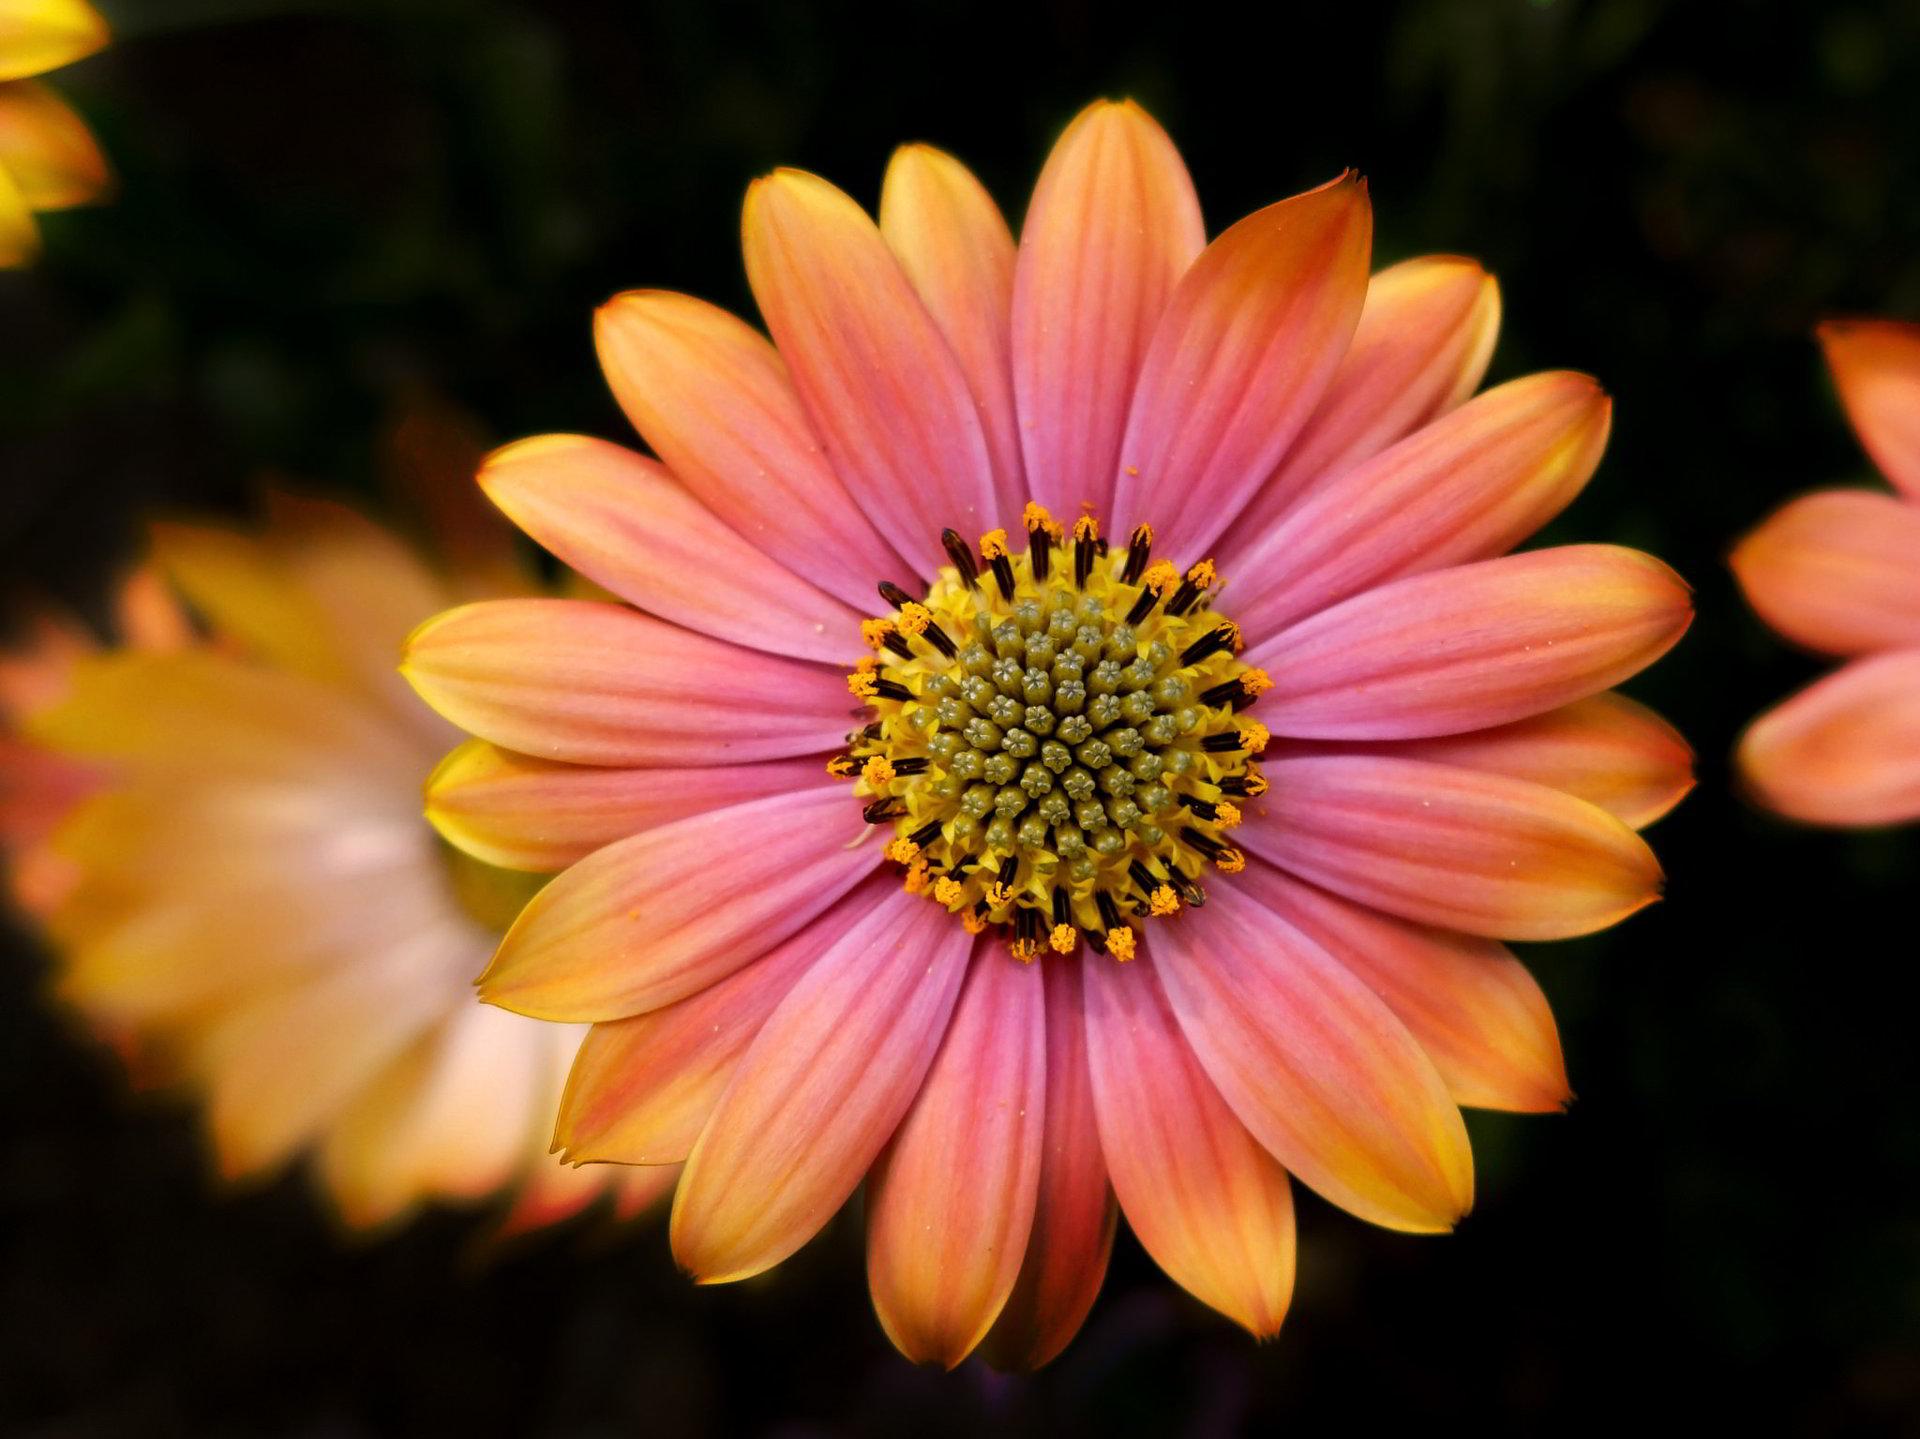 hinh anh hoa cuc dep 41